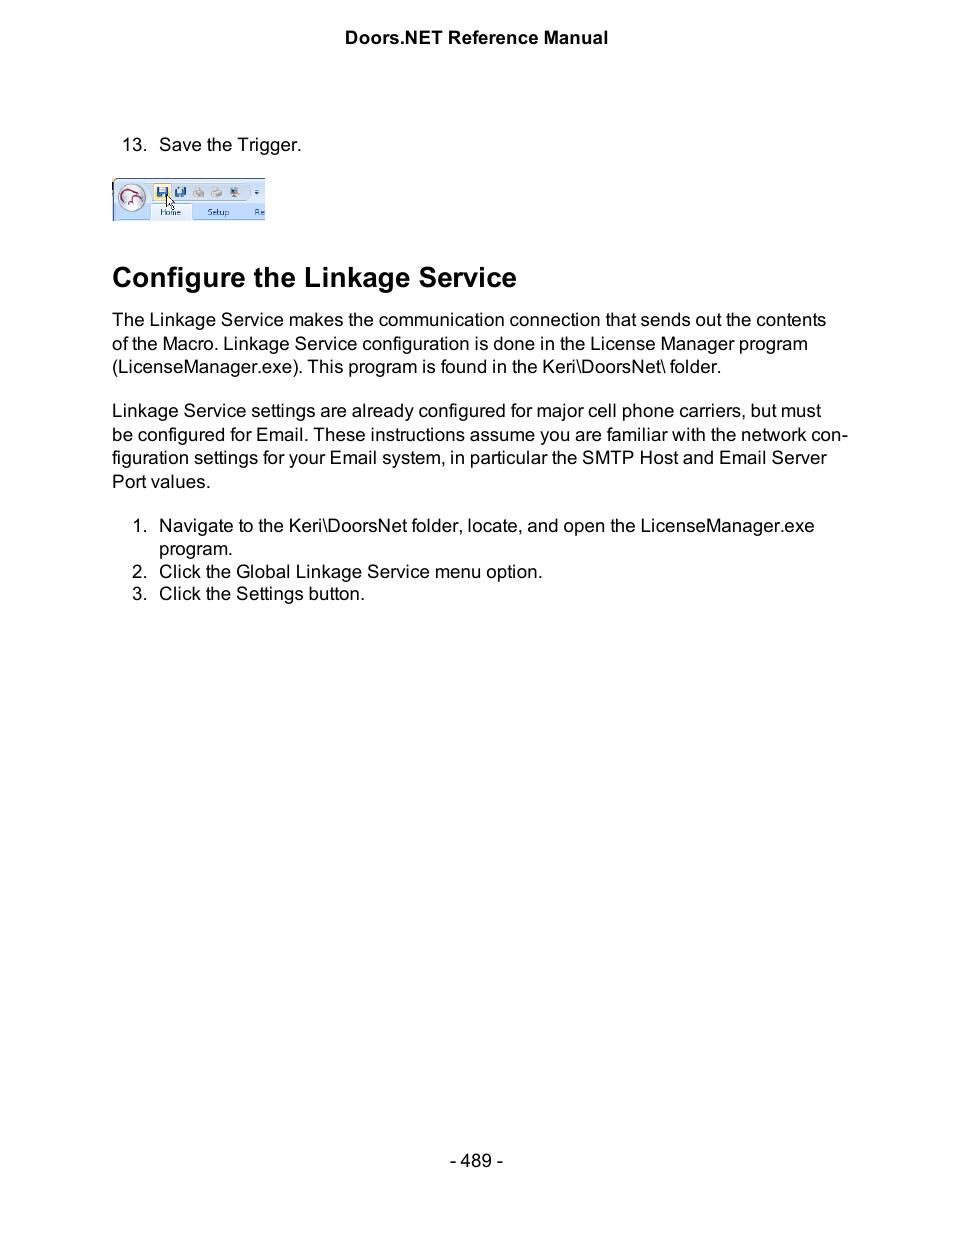 Configure the linkage service Configur | Keri Systems Doors.NET Manual User Manual | Page 489 / 602